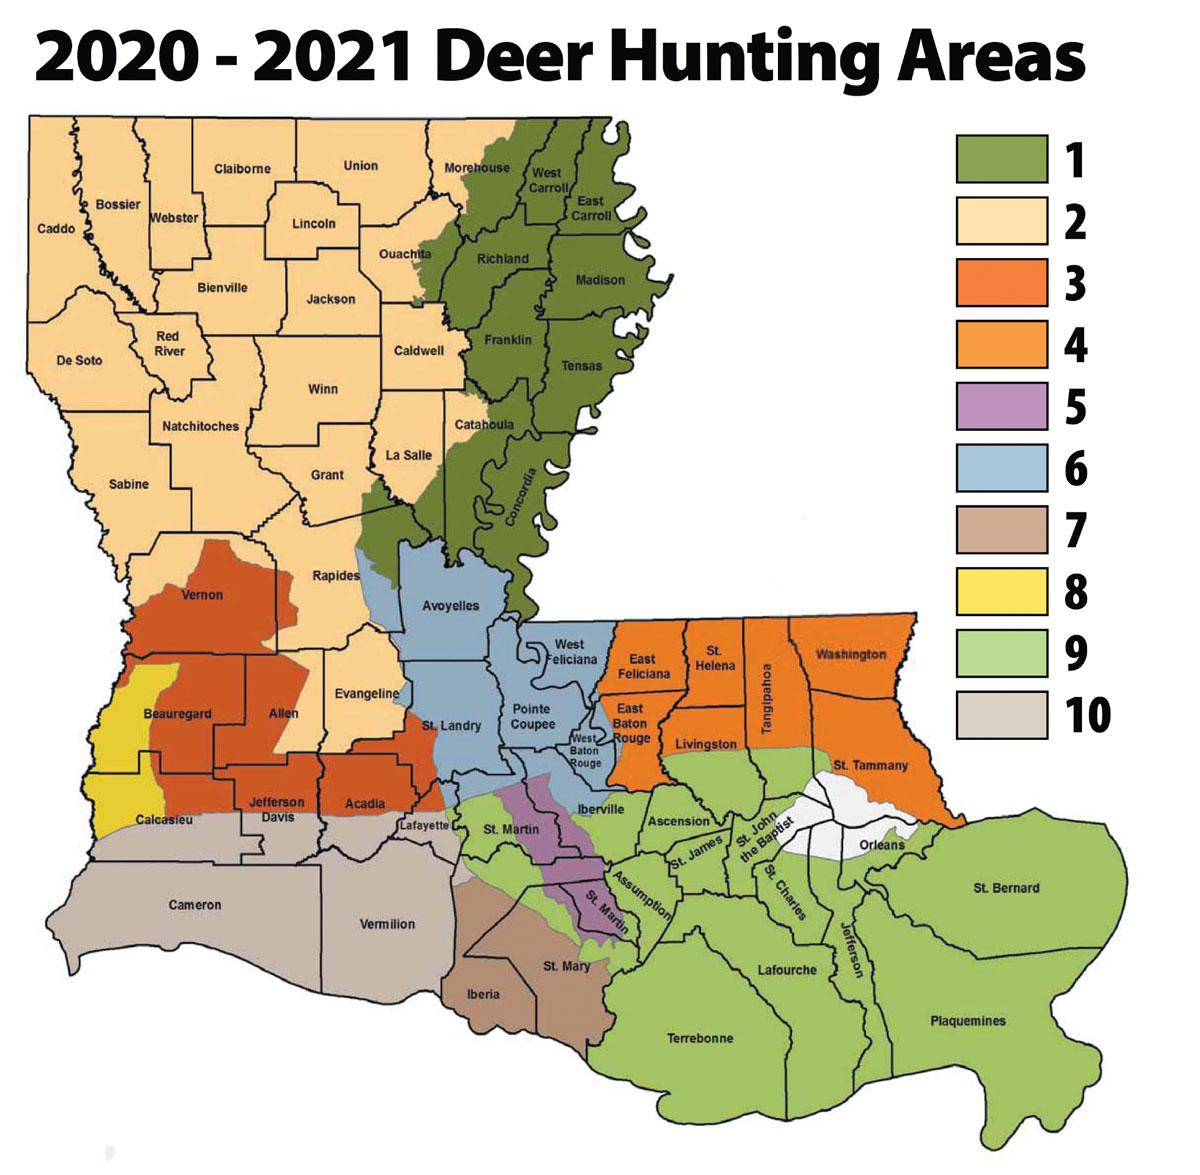 Louisiana'S 2020 Rut Report - Louisiana Sportsman for Whitetail Rut Calendar